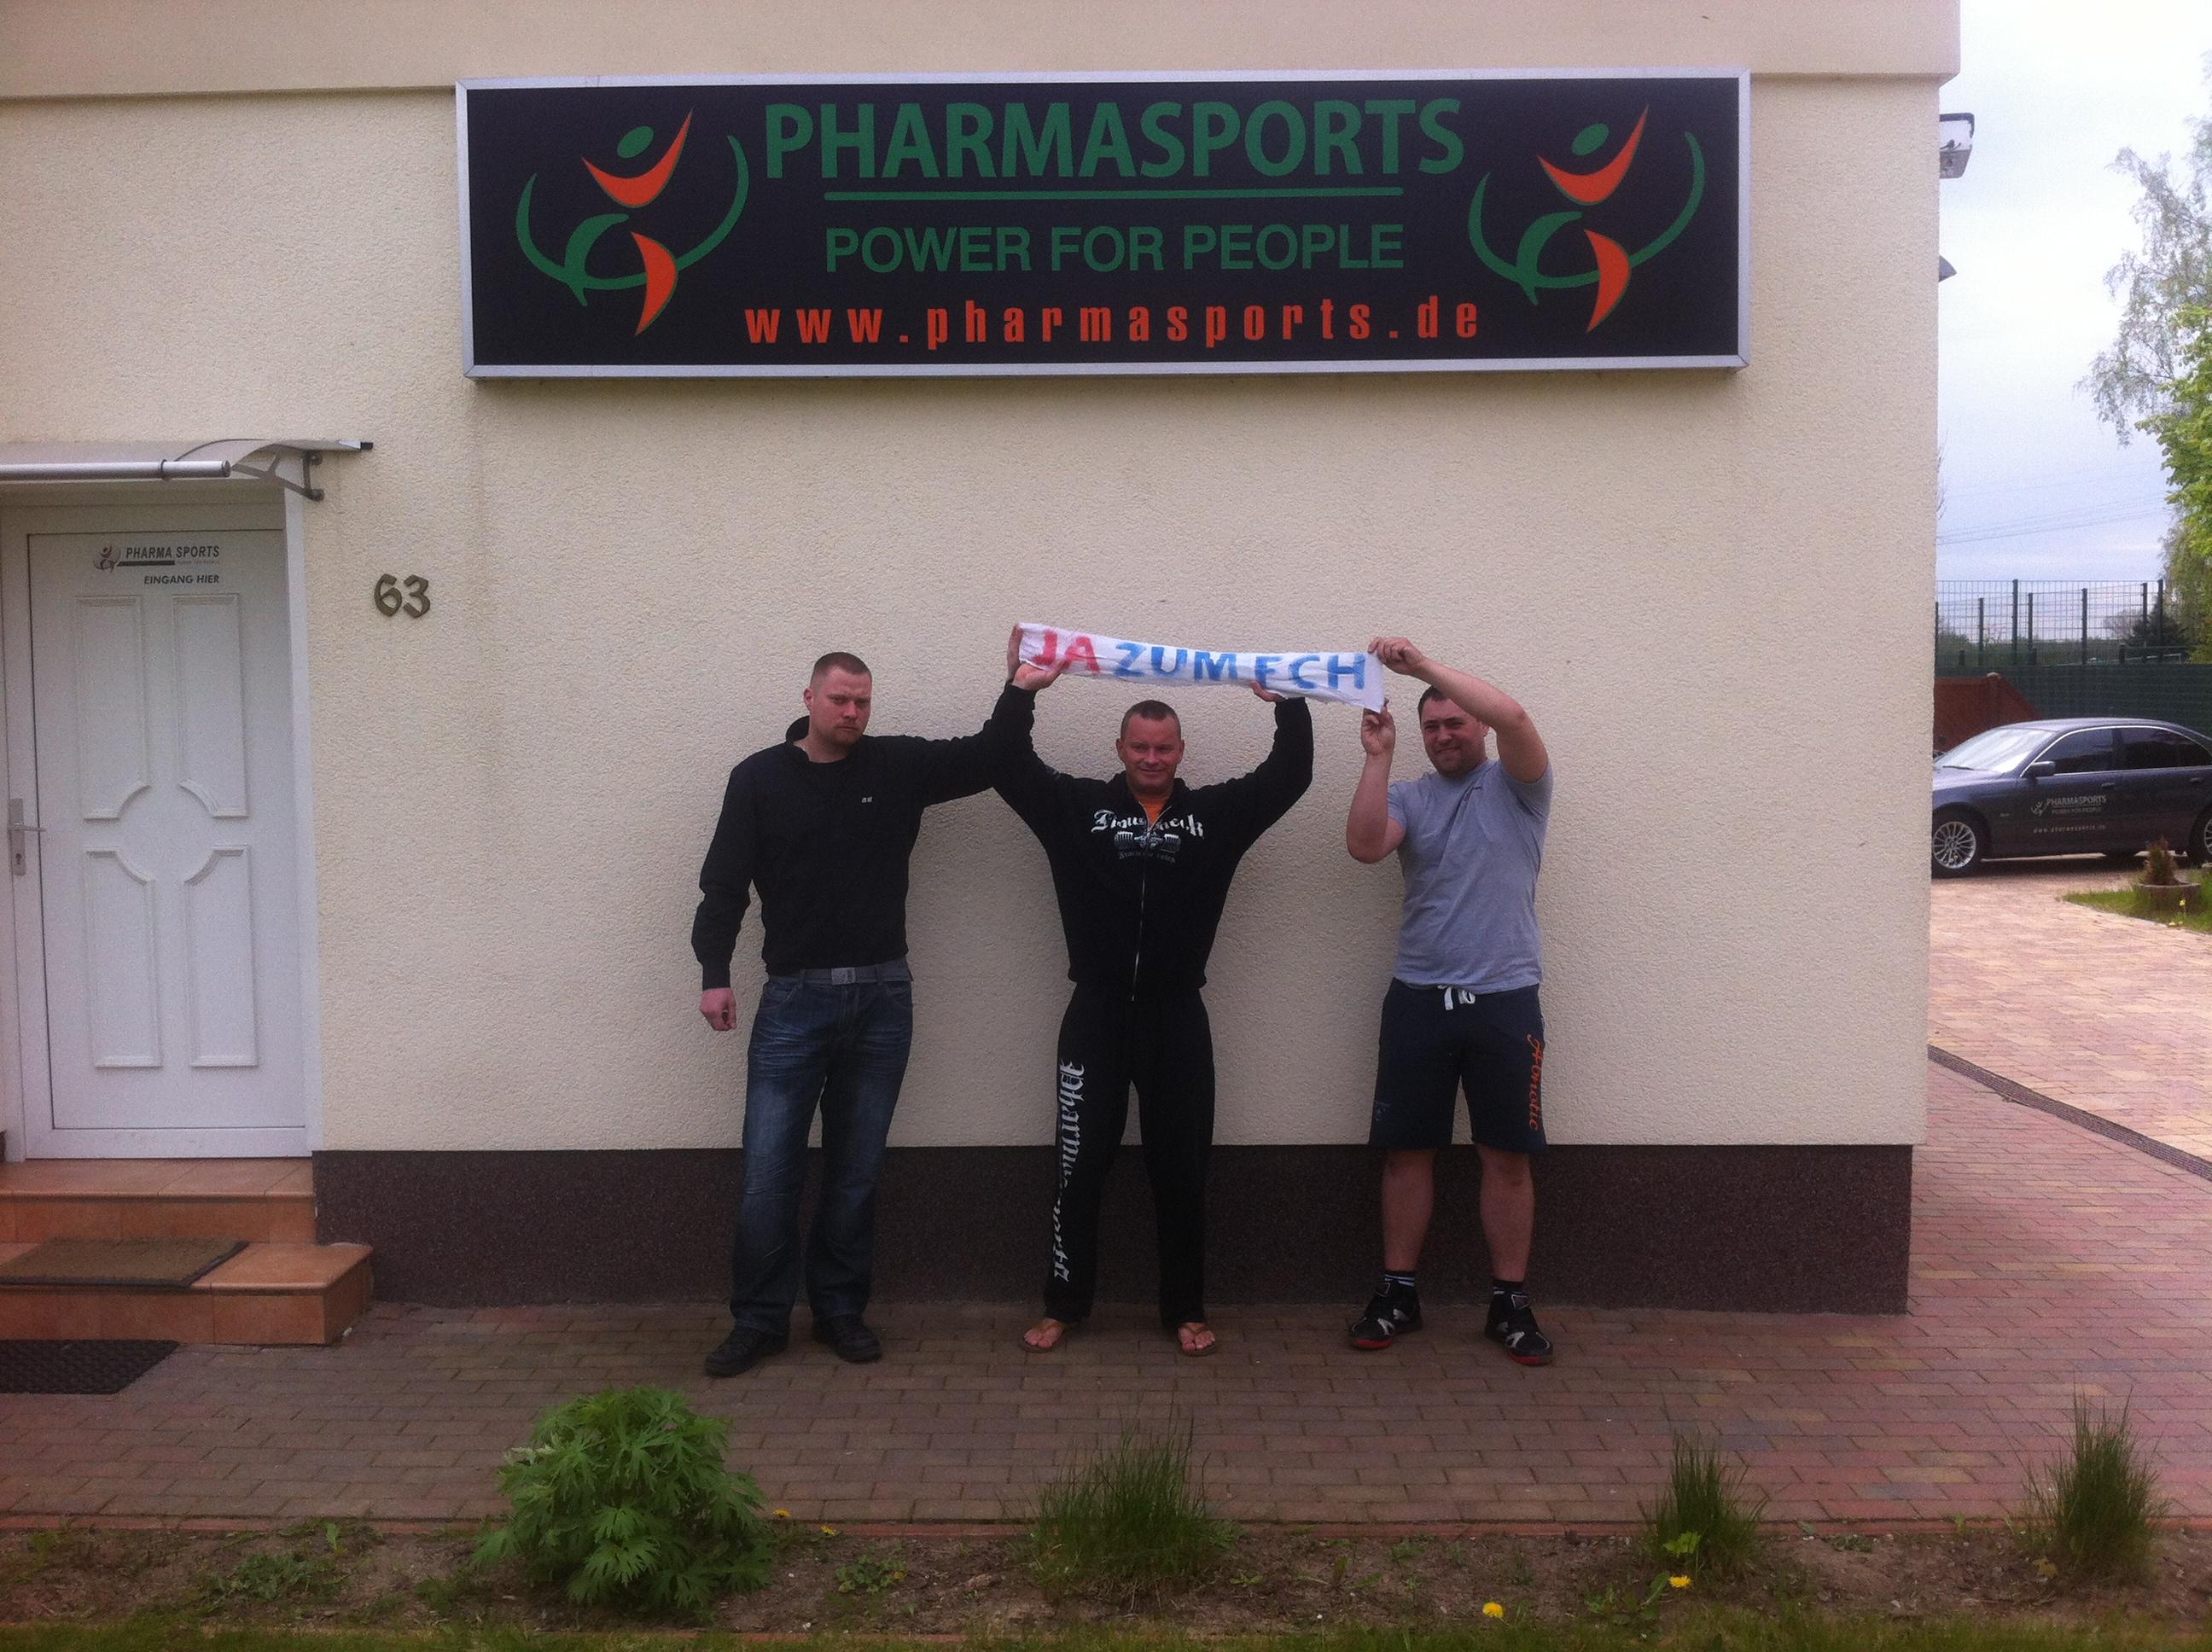 Pharmasports sagt Ja zum F.C.H  Hansa Rostock